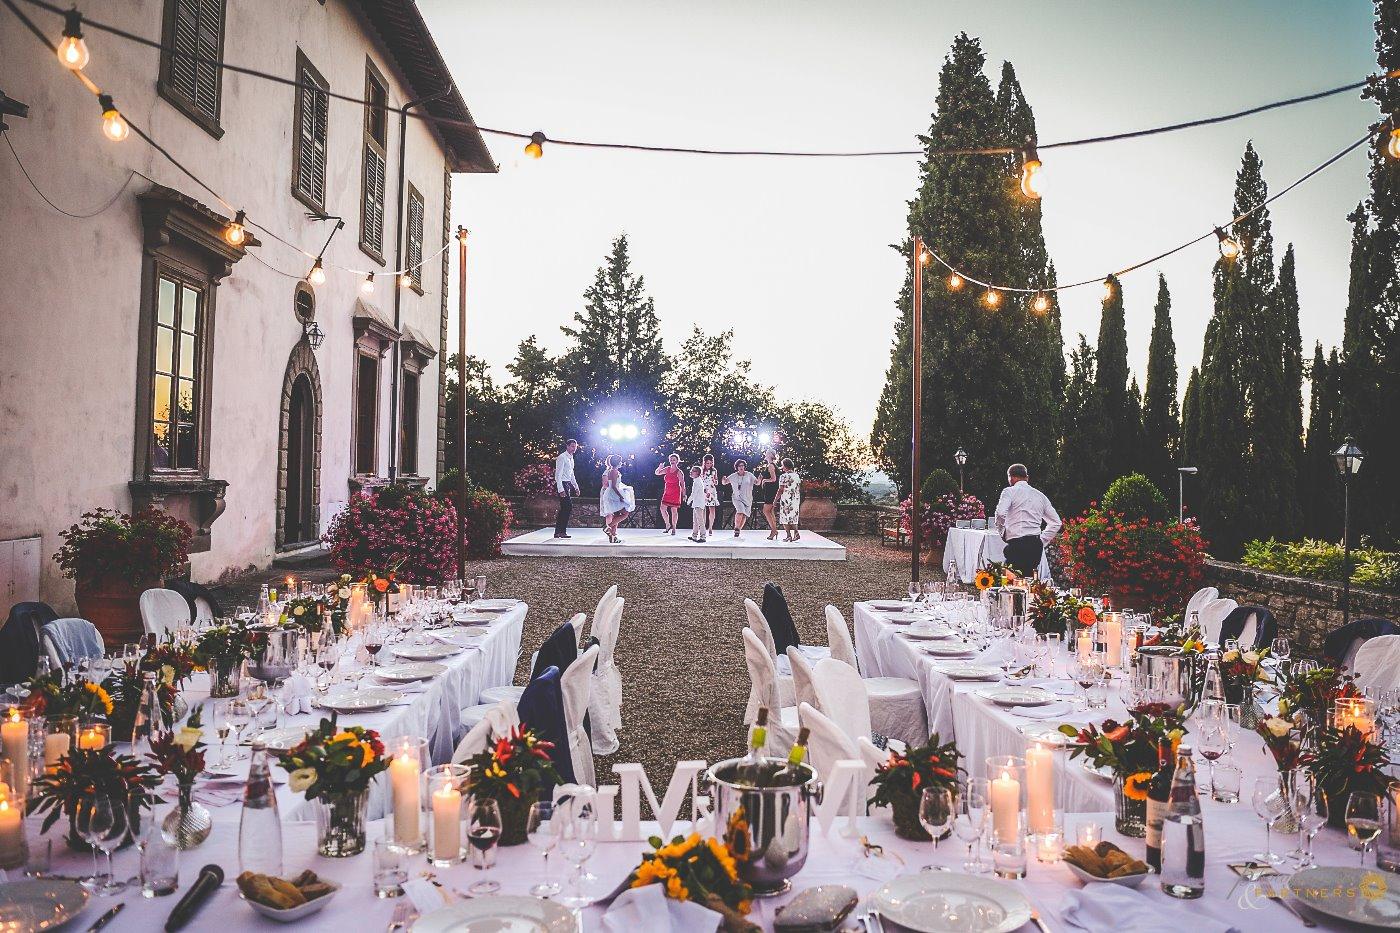 photography_weddings_vicchiomaggio_19.jpg